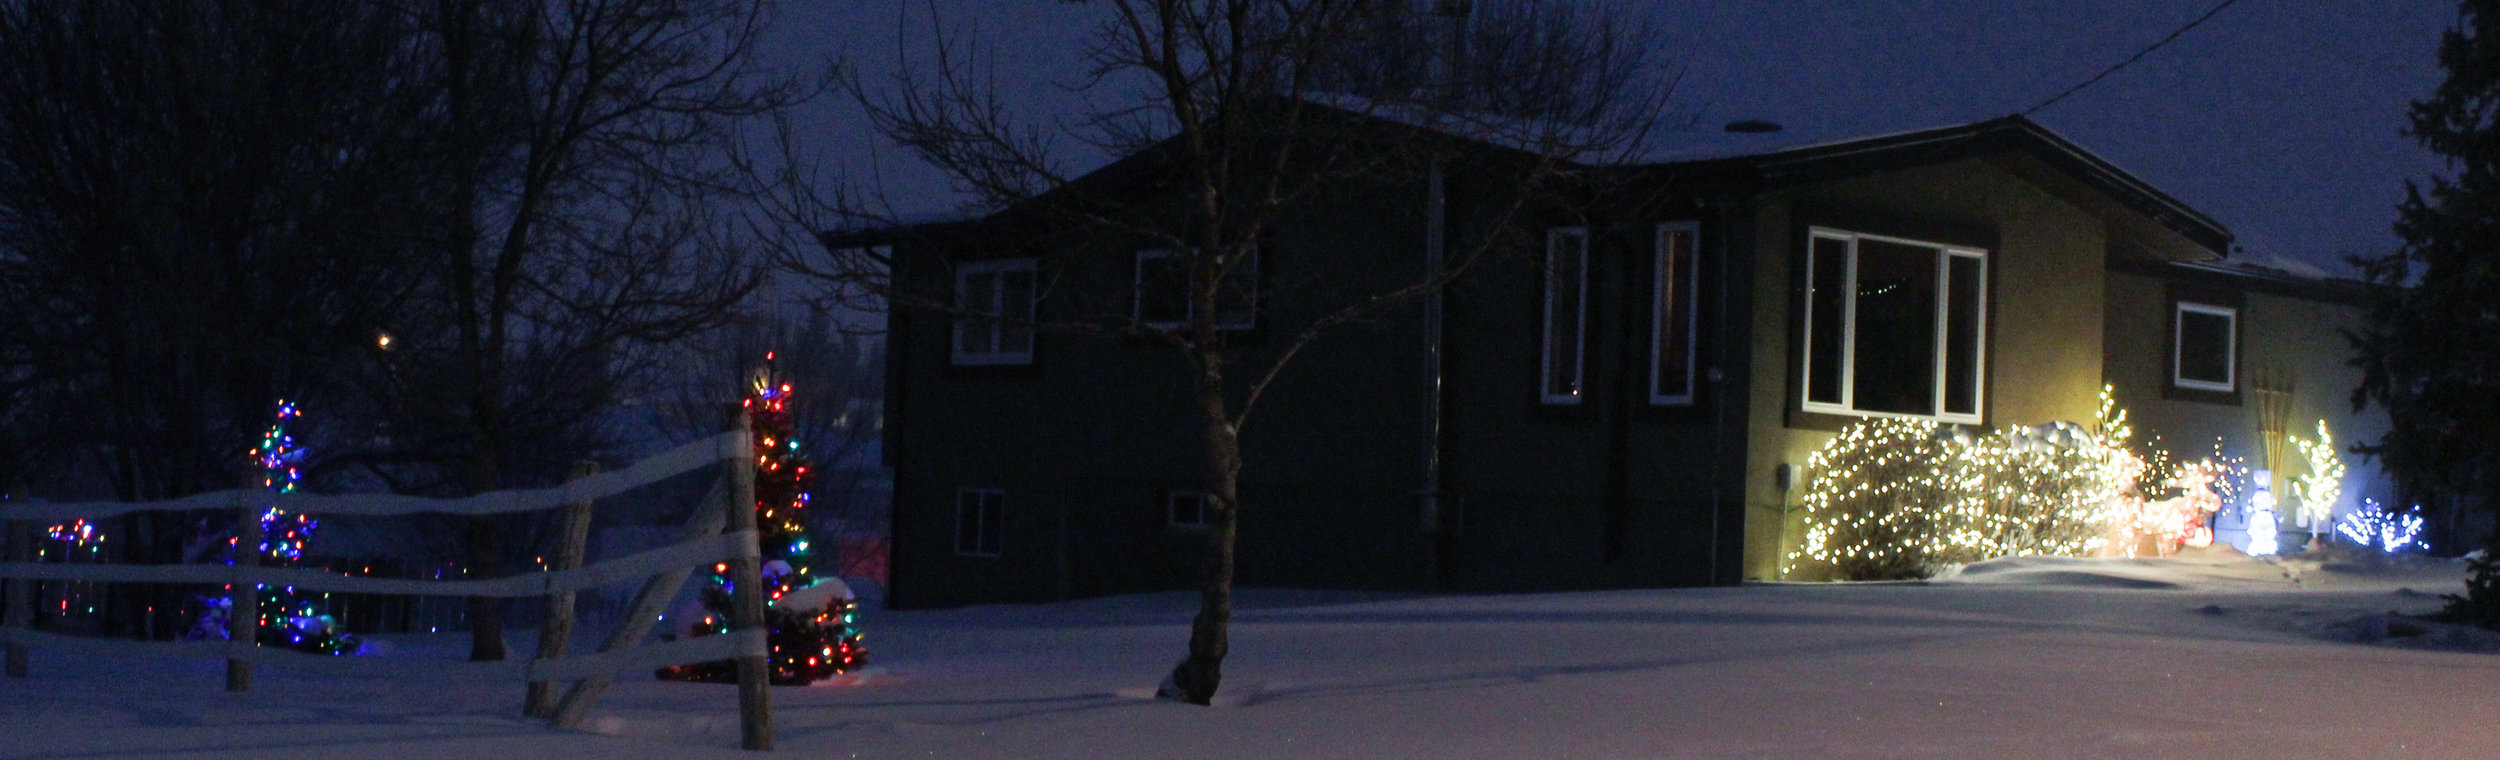 Winter Lights Winners (3 of 3).jpg